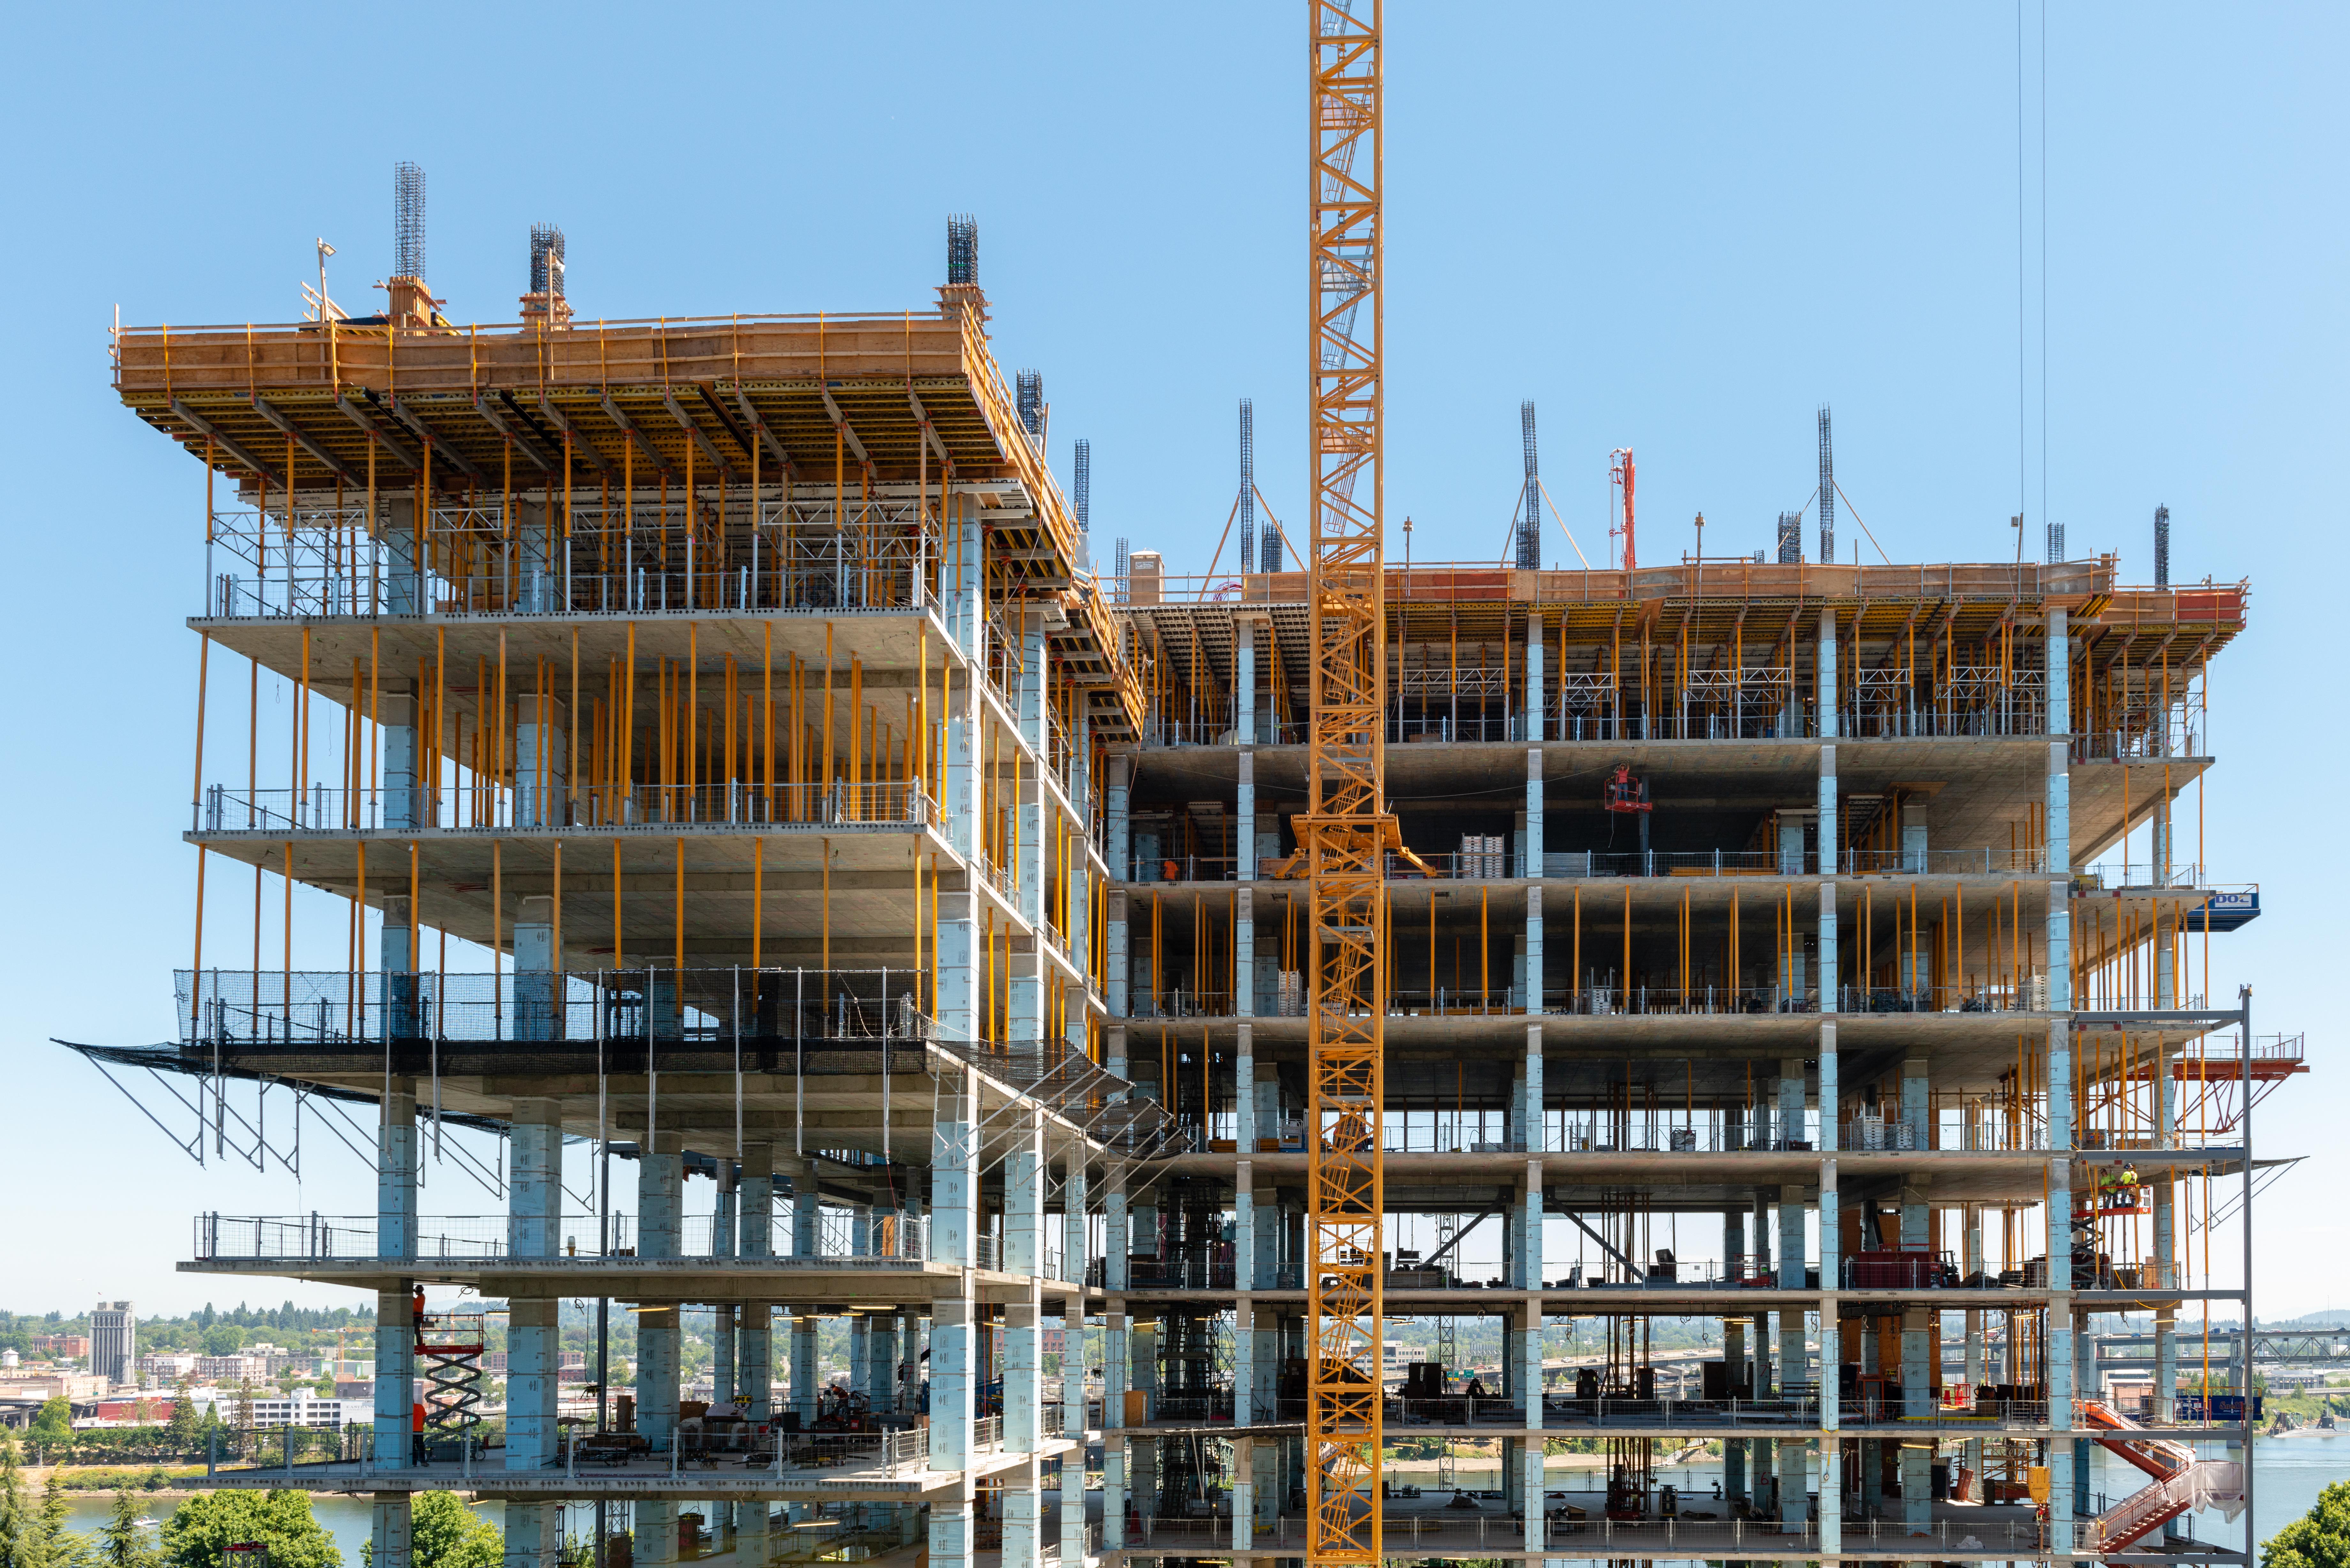 A construction site in Portland, Ore., on July 24. (Heidi de Marco/KHN)